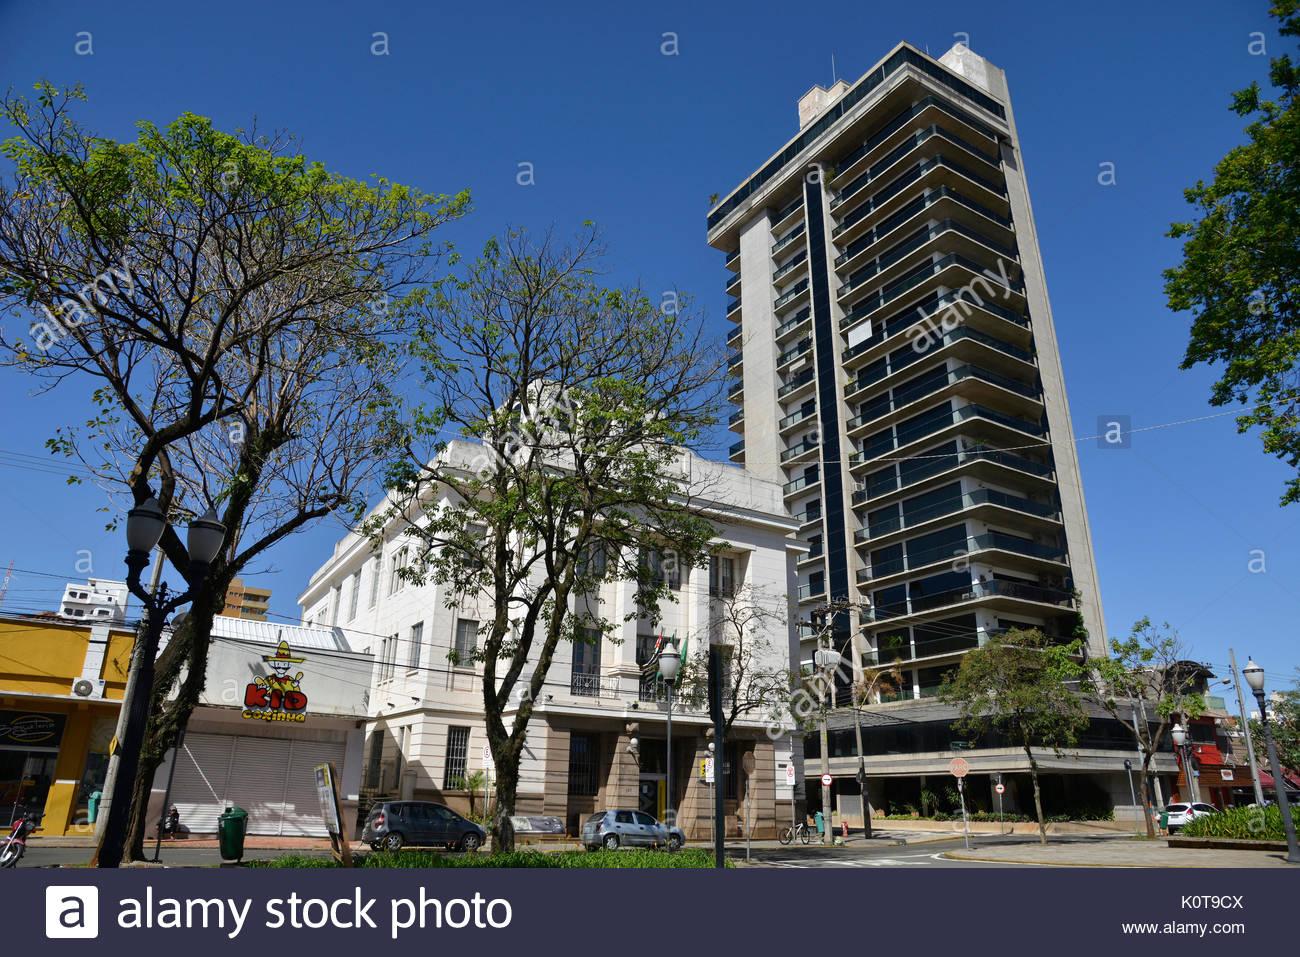 Banking, old building, 2016, Jose Bonifacio Square, center, Piracicaba, Sao Paulo, Brazil. - Stock Image